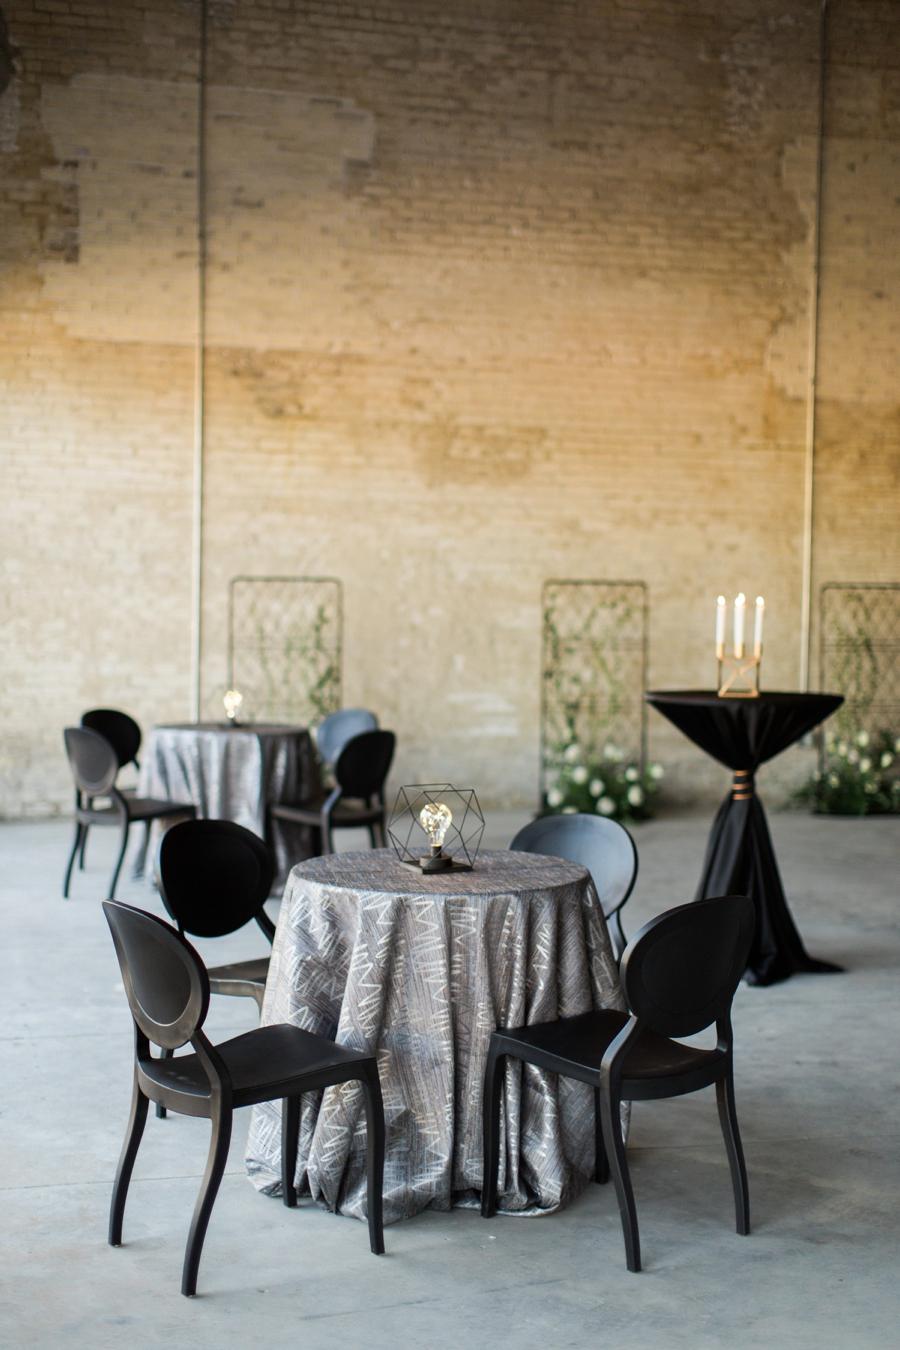 Modern Industrial Chic Wedding Inspiration via TheELD.com